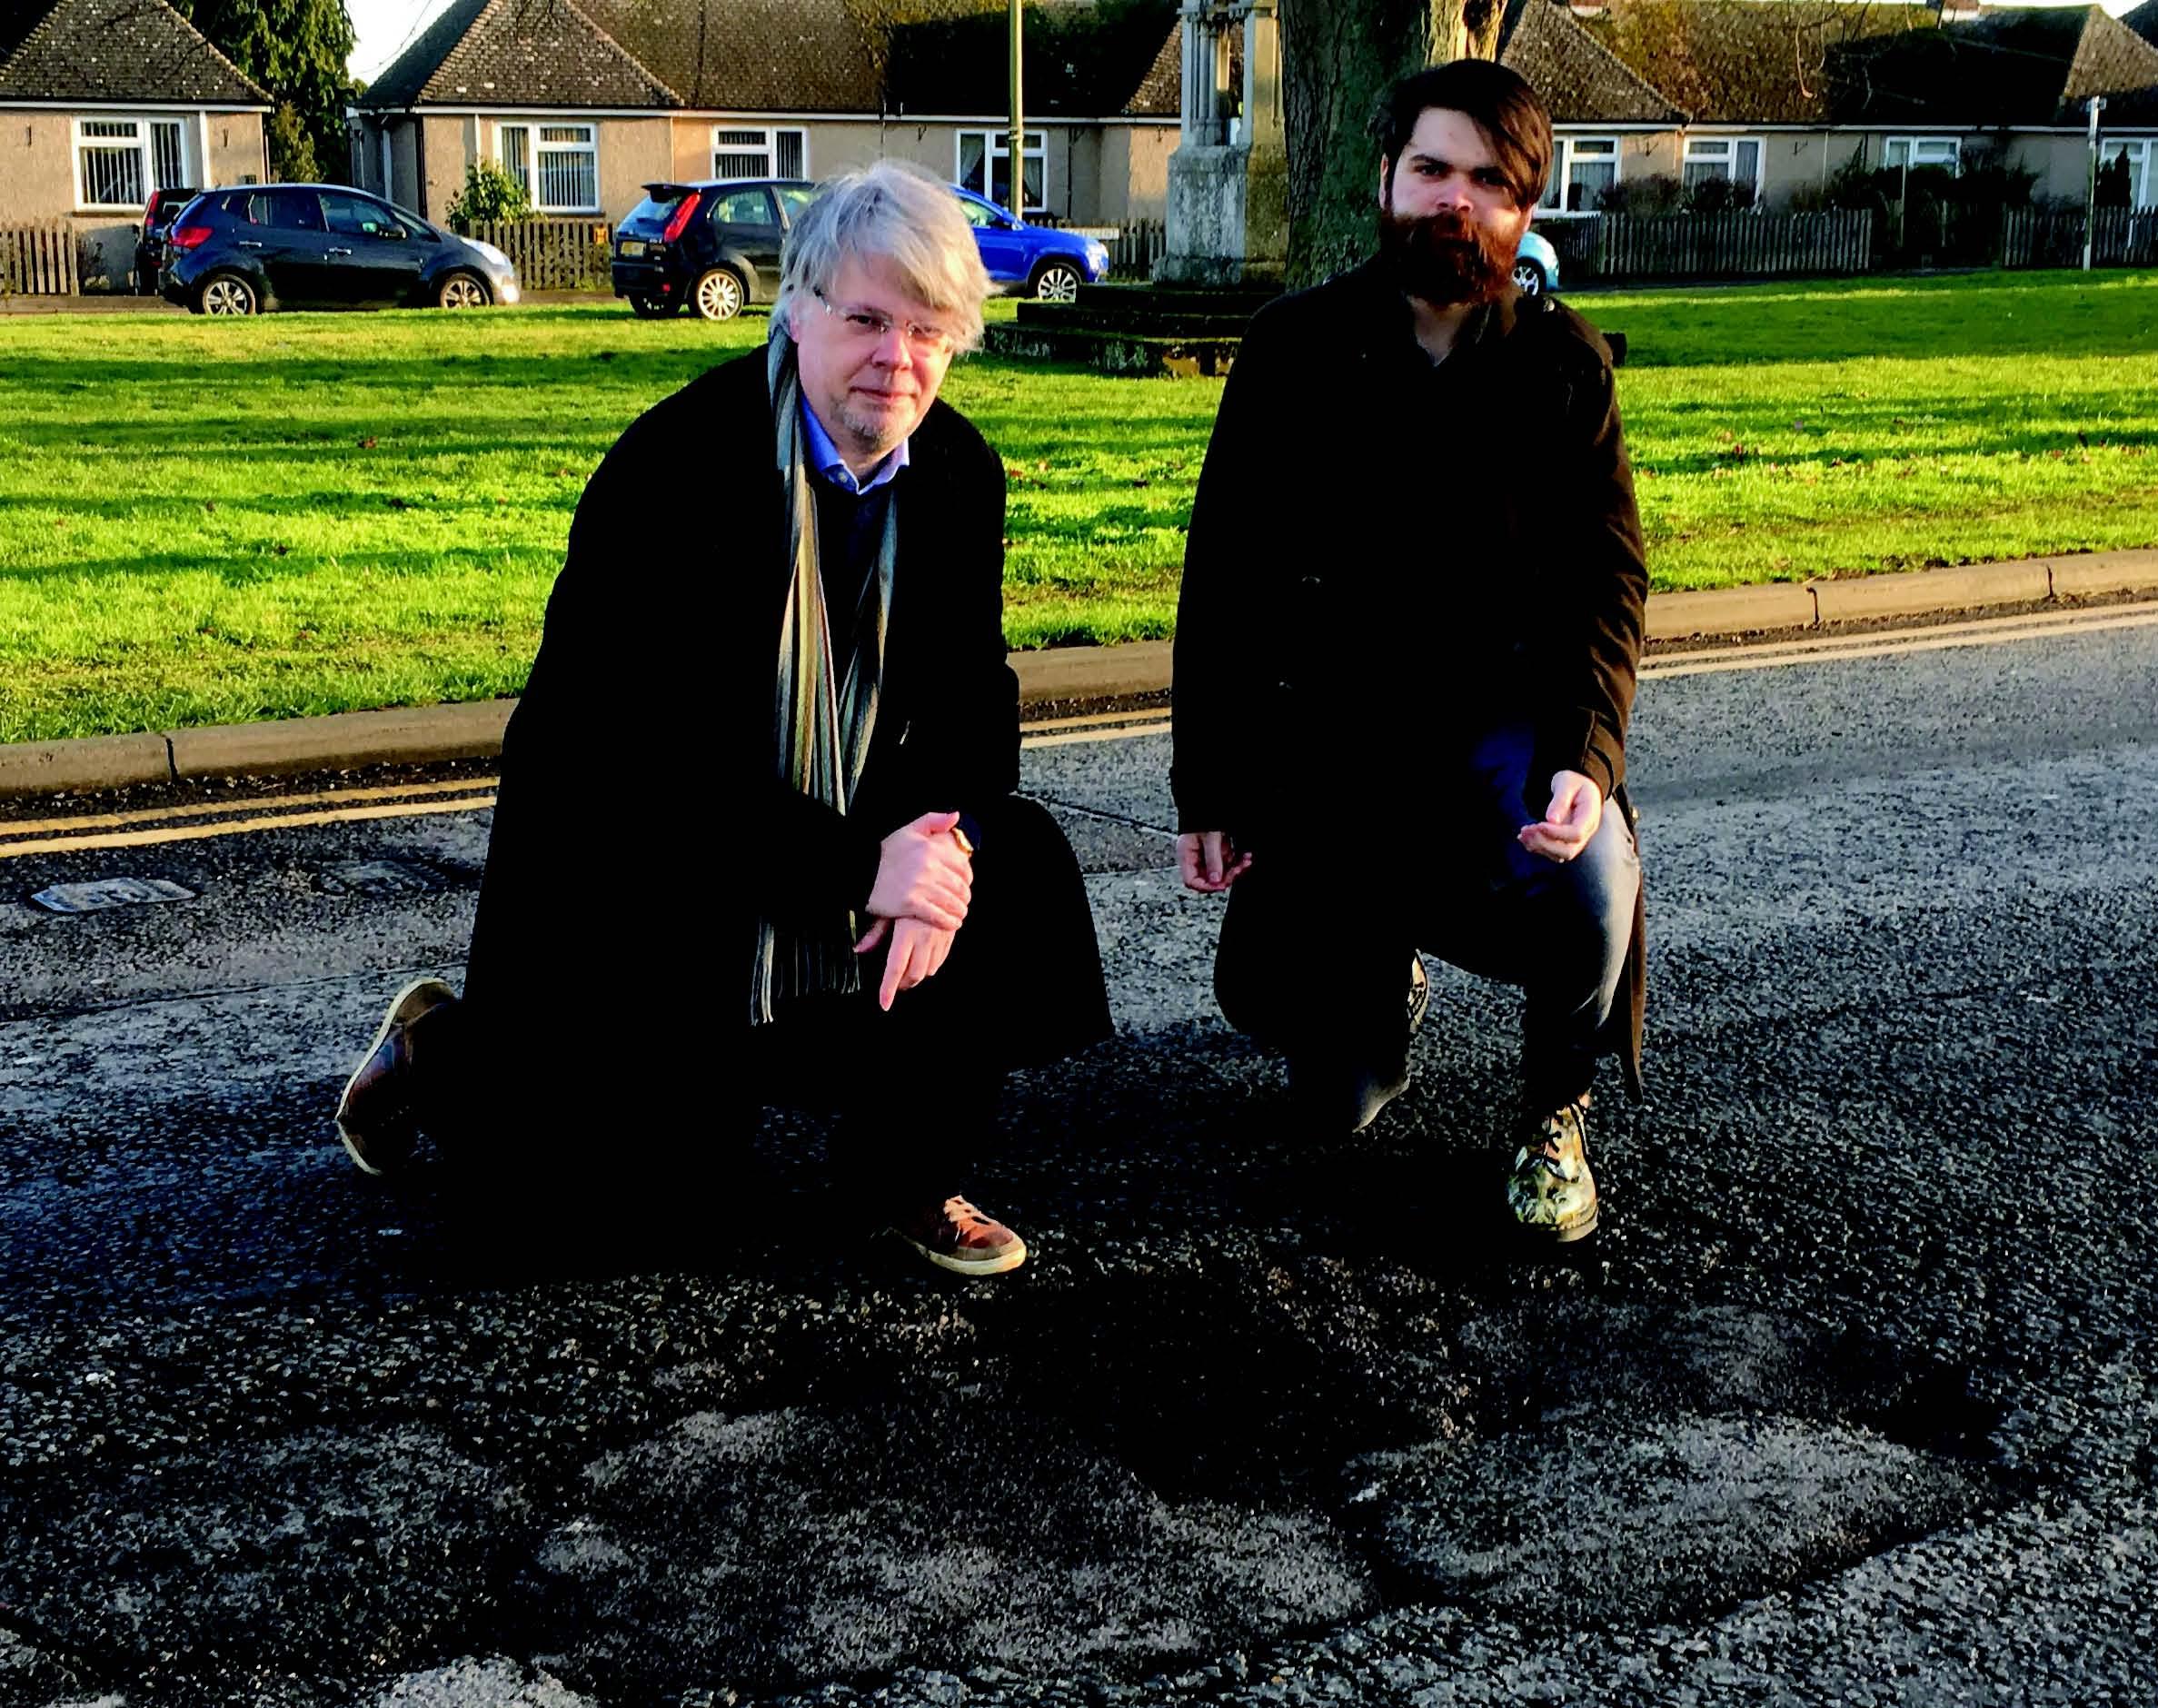 Potholes on Brays Lane